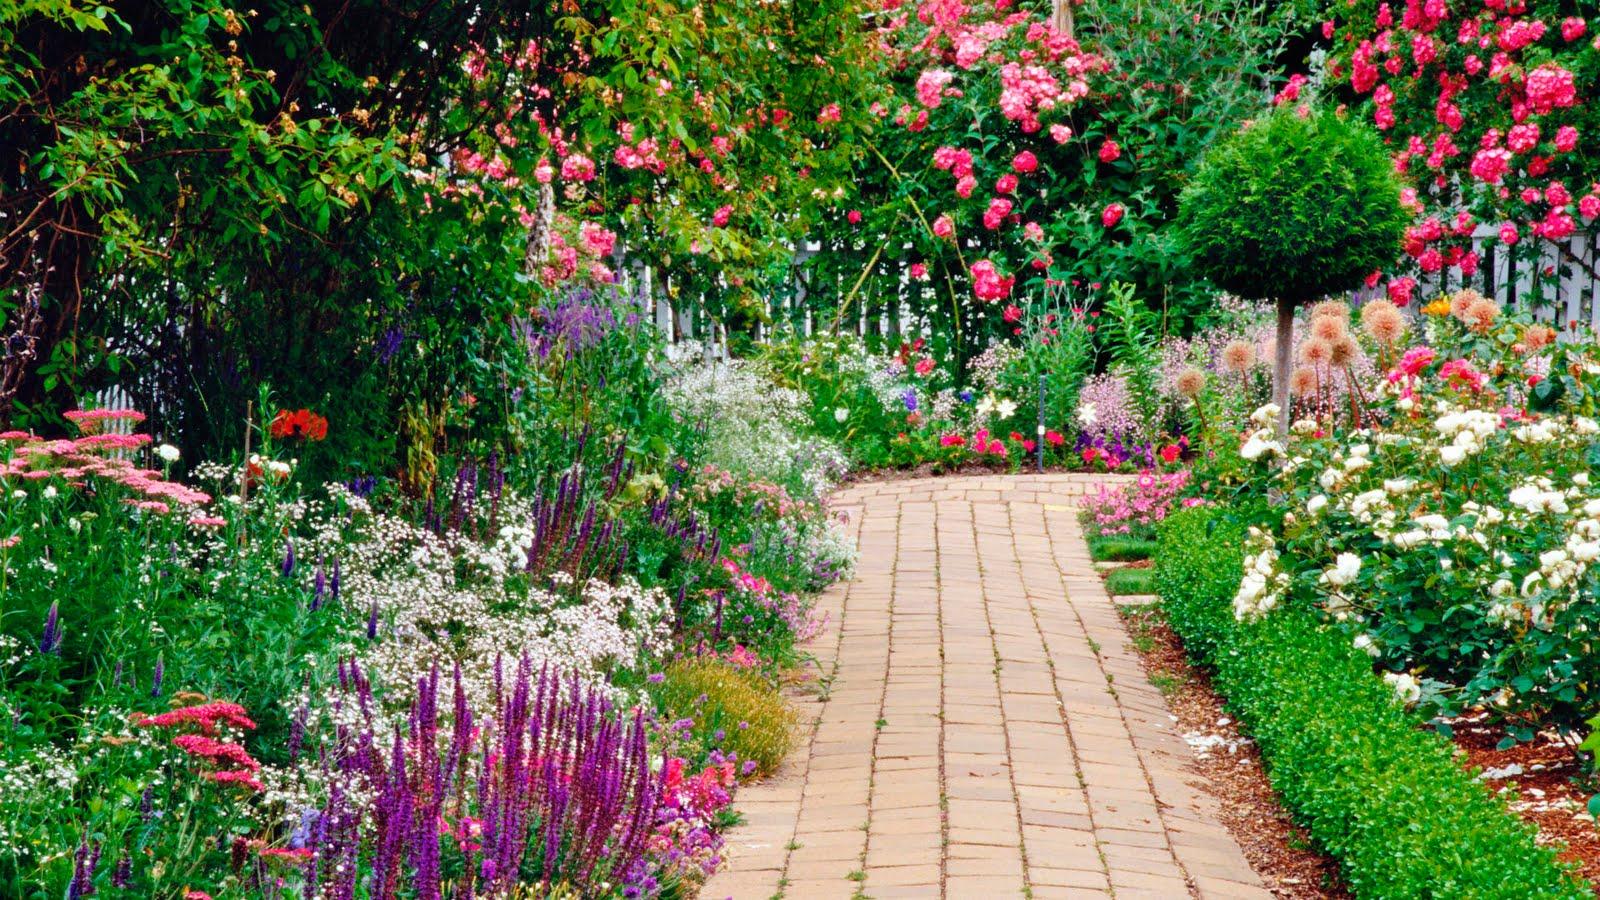 flores jardins fotos : flores jardins fotos:Summer Garden